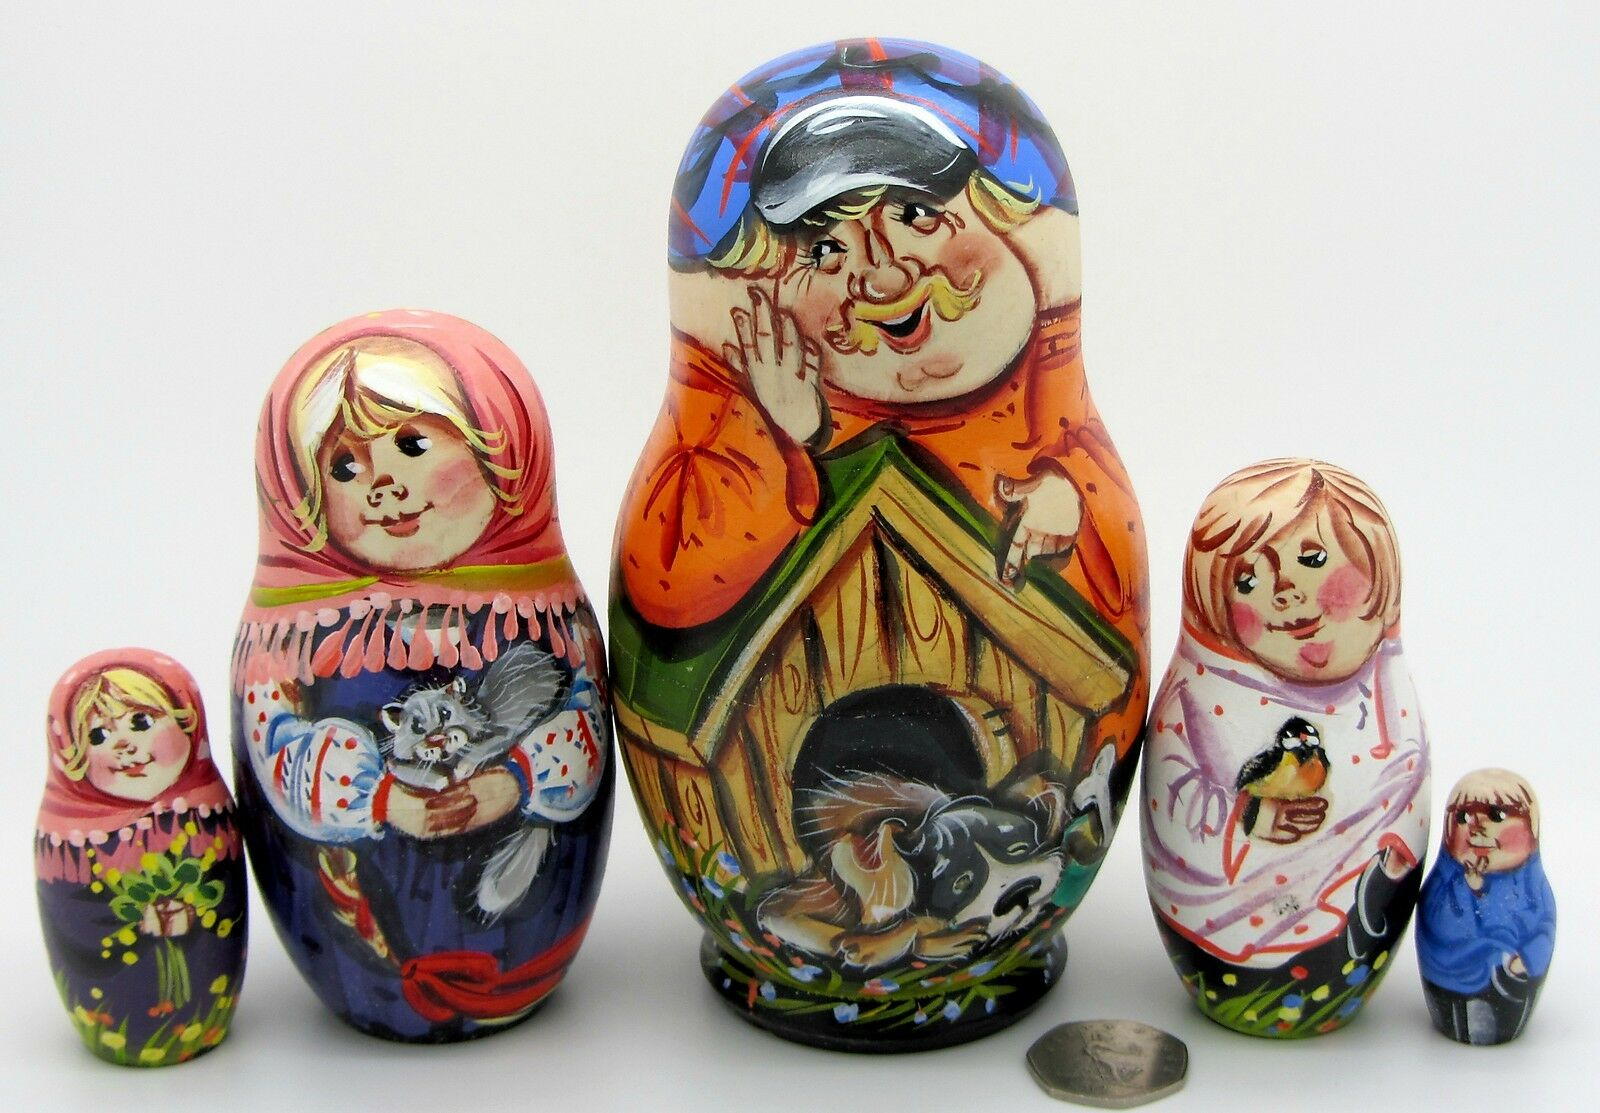 Dtuttia Russia Bambola Matrioska Baautobushka  5 Cane Gree & Dad Famiglia Opaco  grande vendita